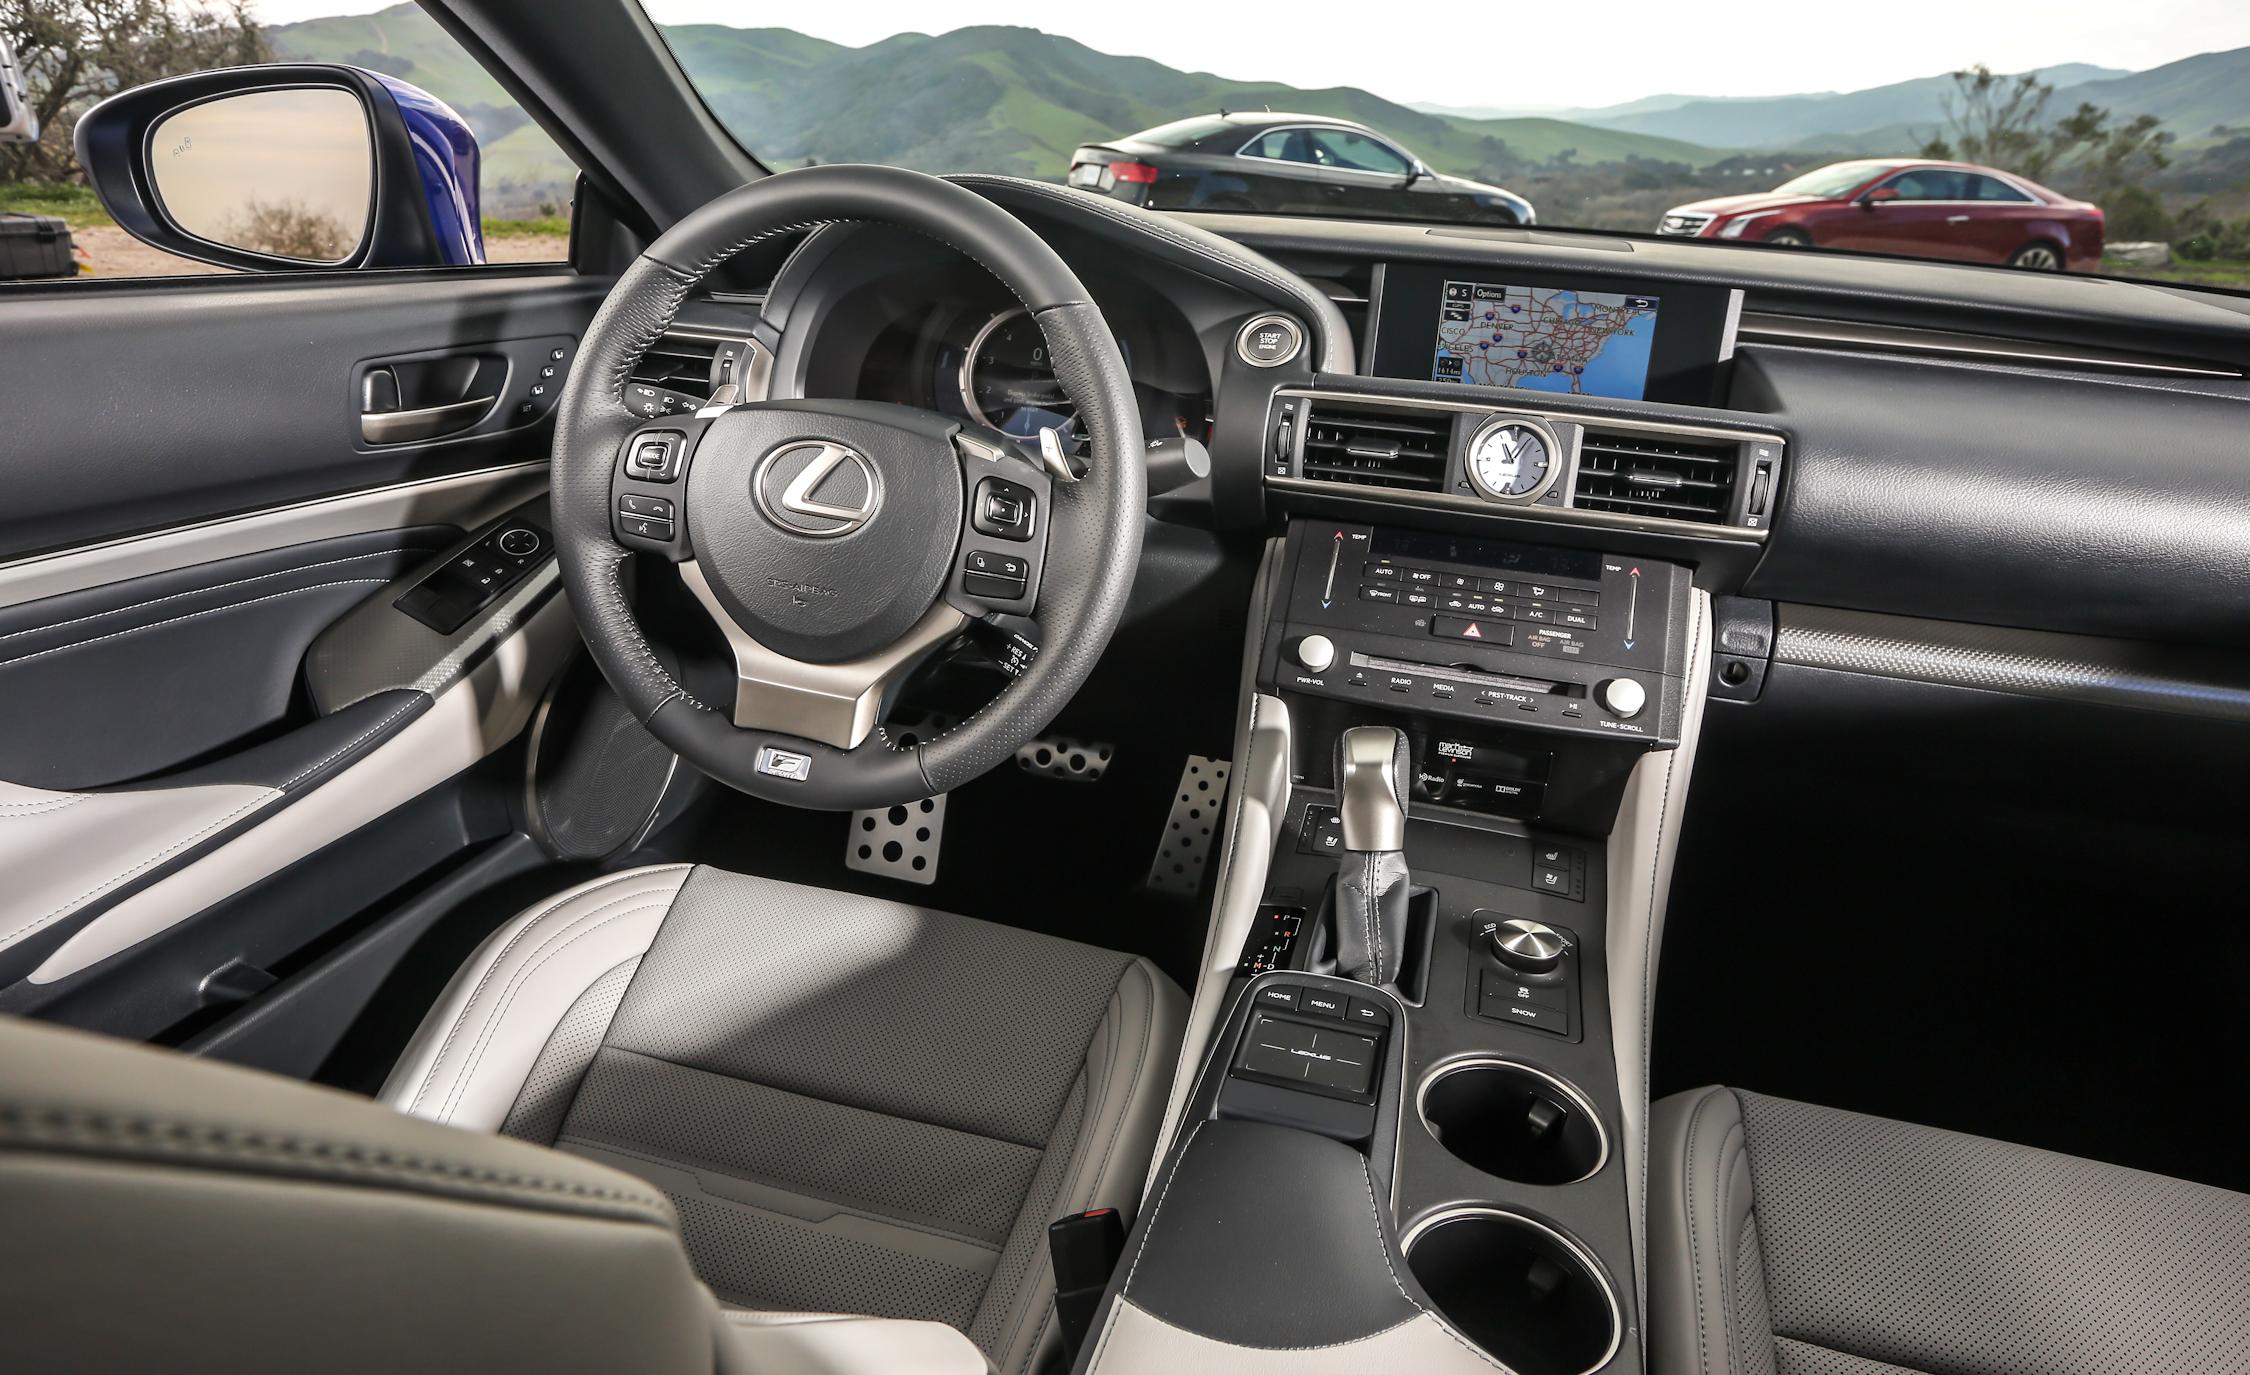 2015 Lexus RC350 F Sport Cockpit and Dashboard